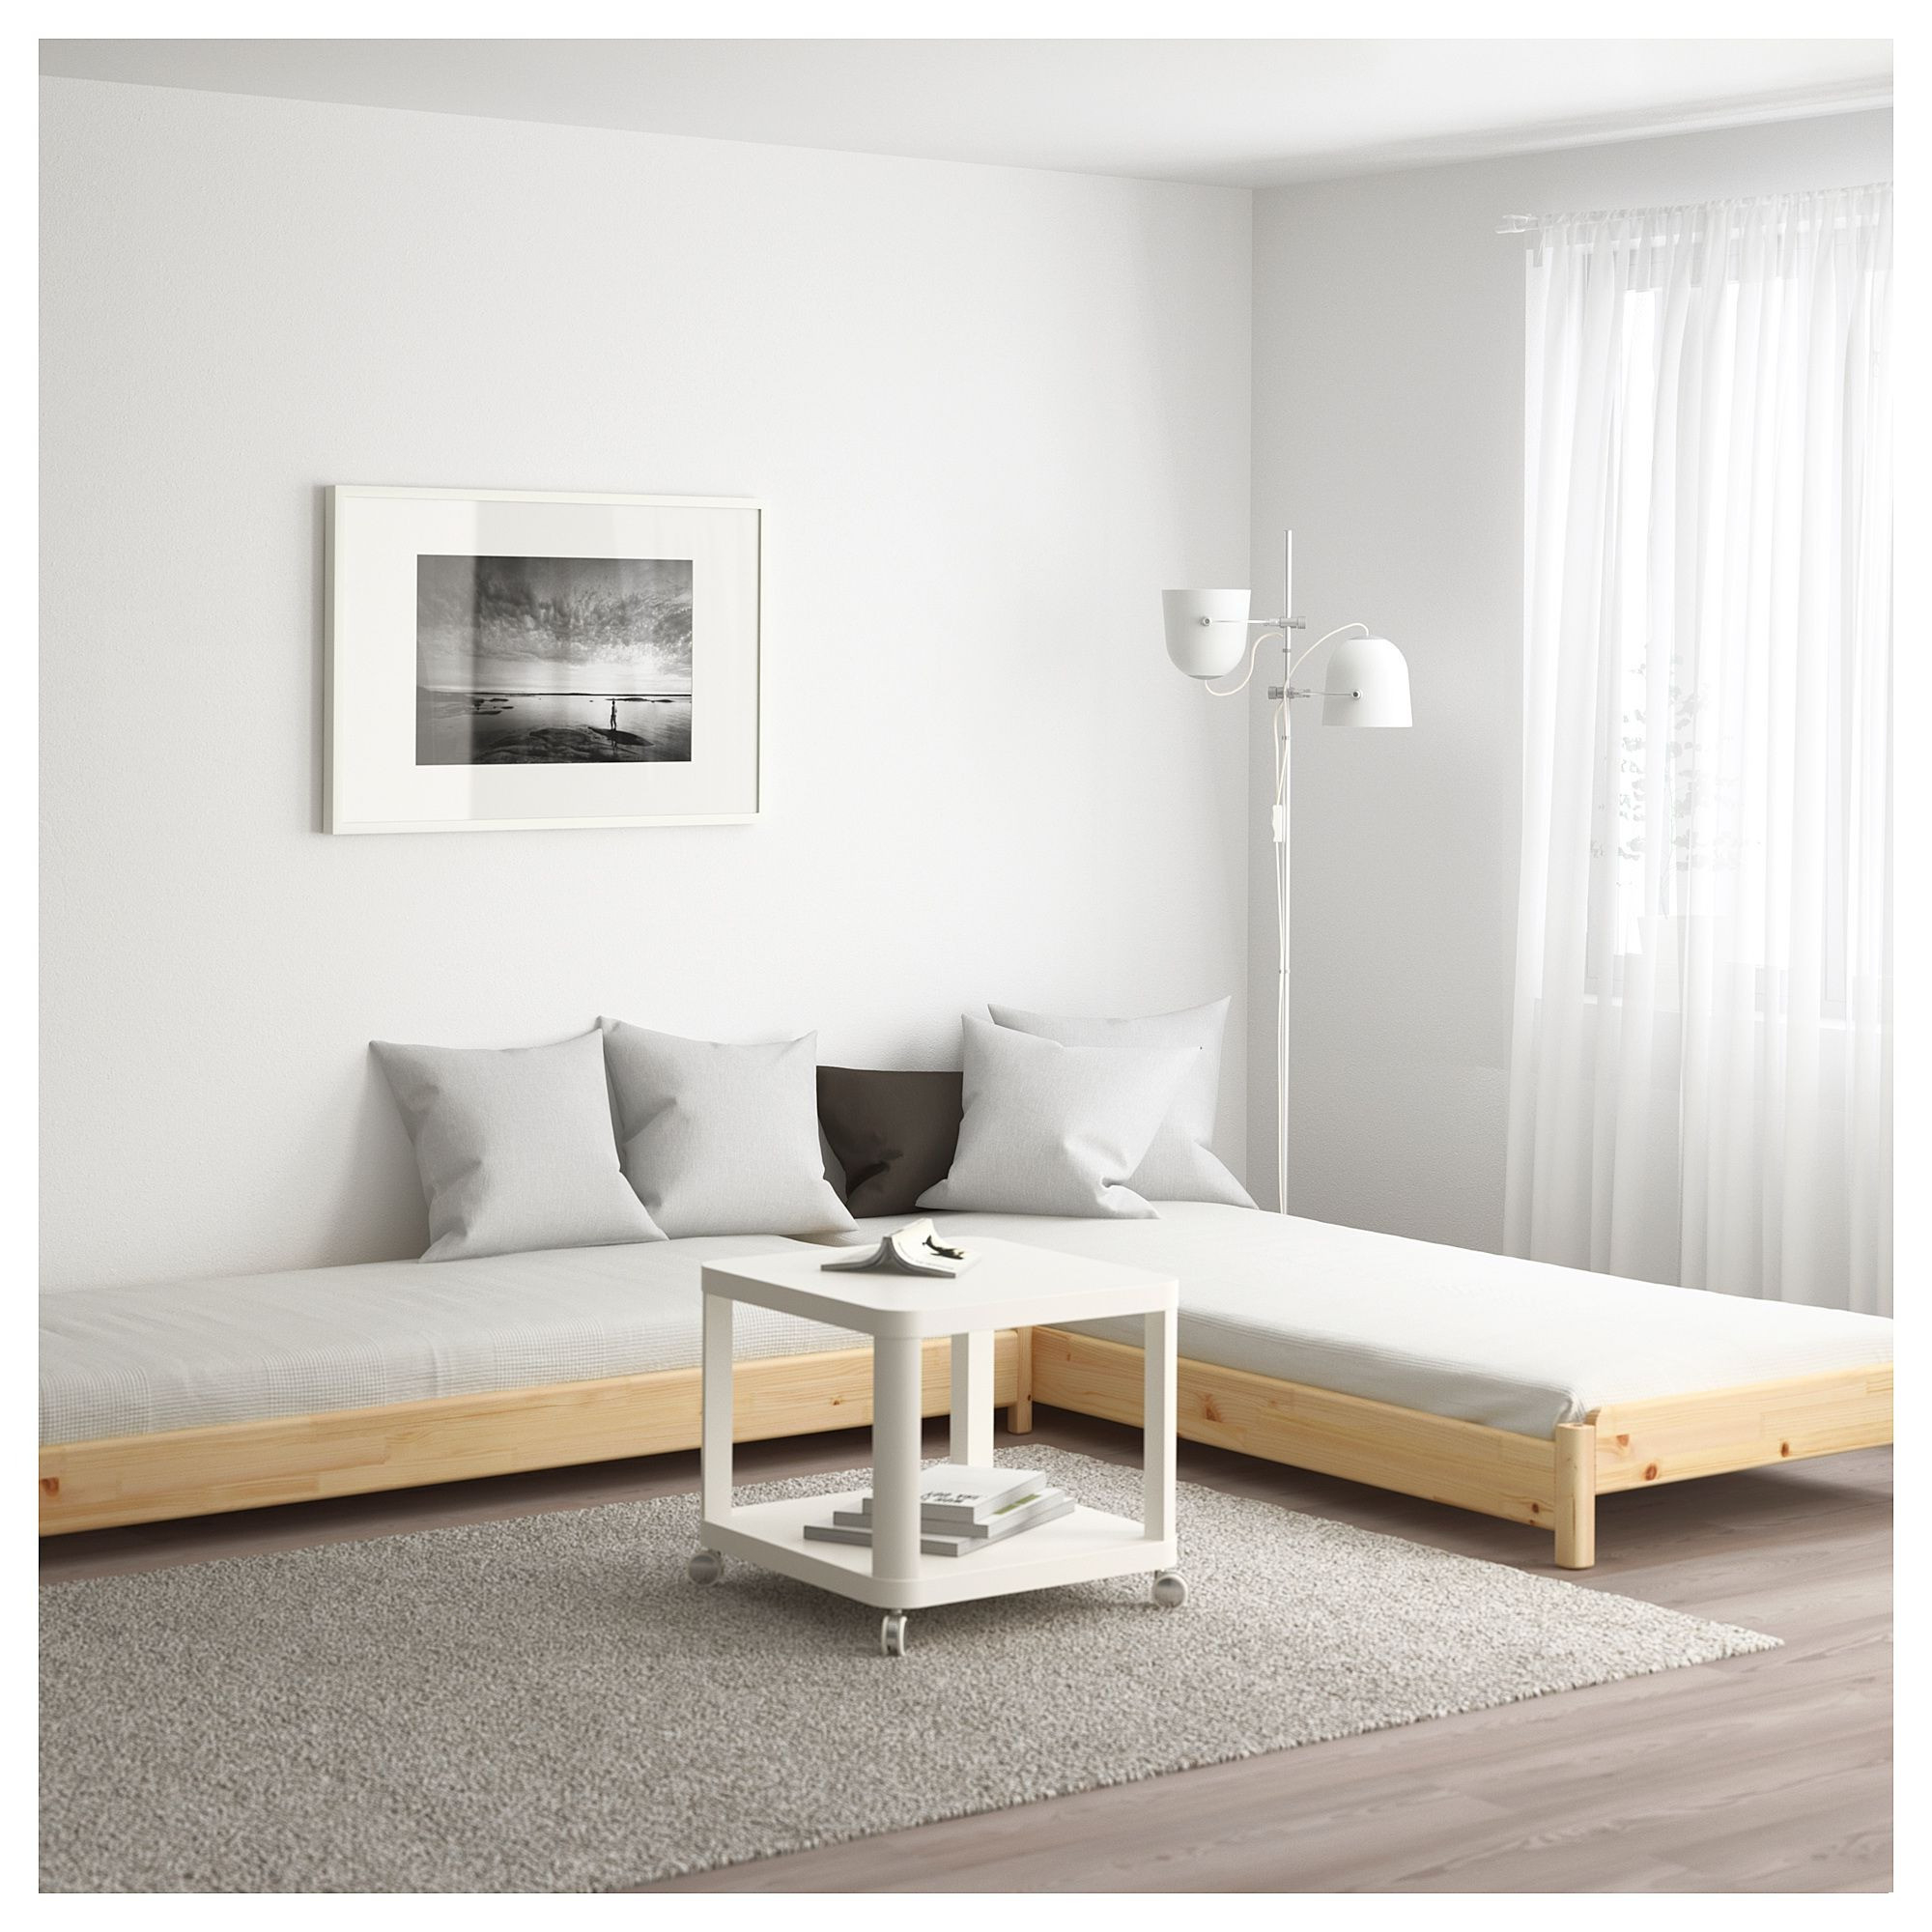 Ikea sofas Cama 3id6 sofa Rinconera Ikea New sofas Cama Ikea fortable sofa Cama Ikea Best